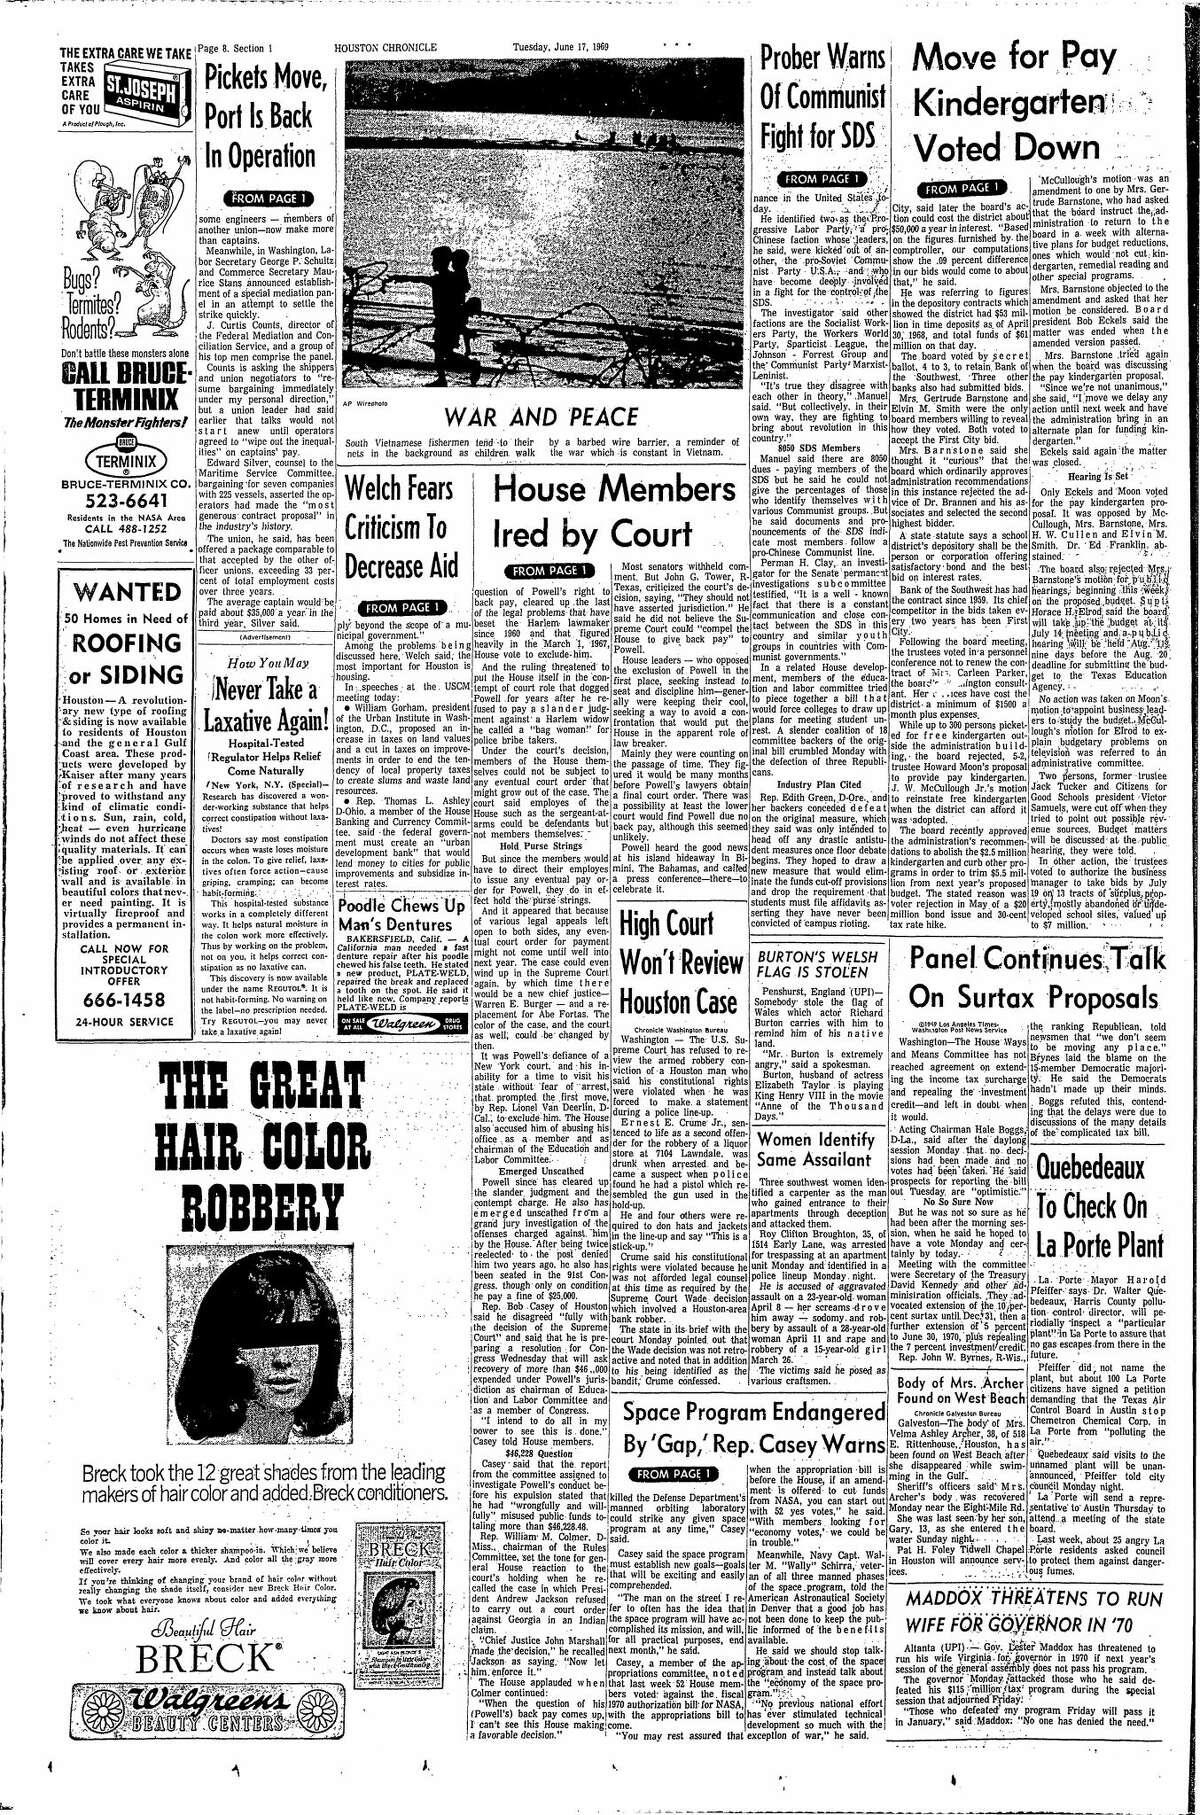 June 17, 1969